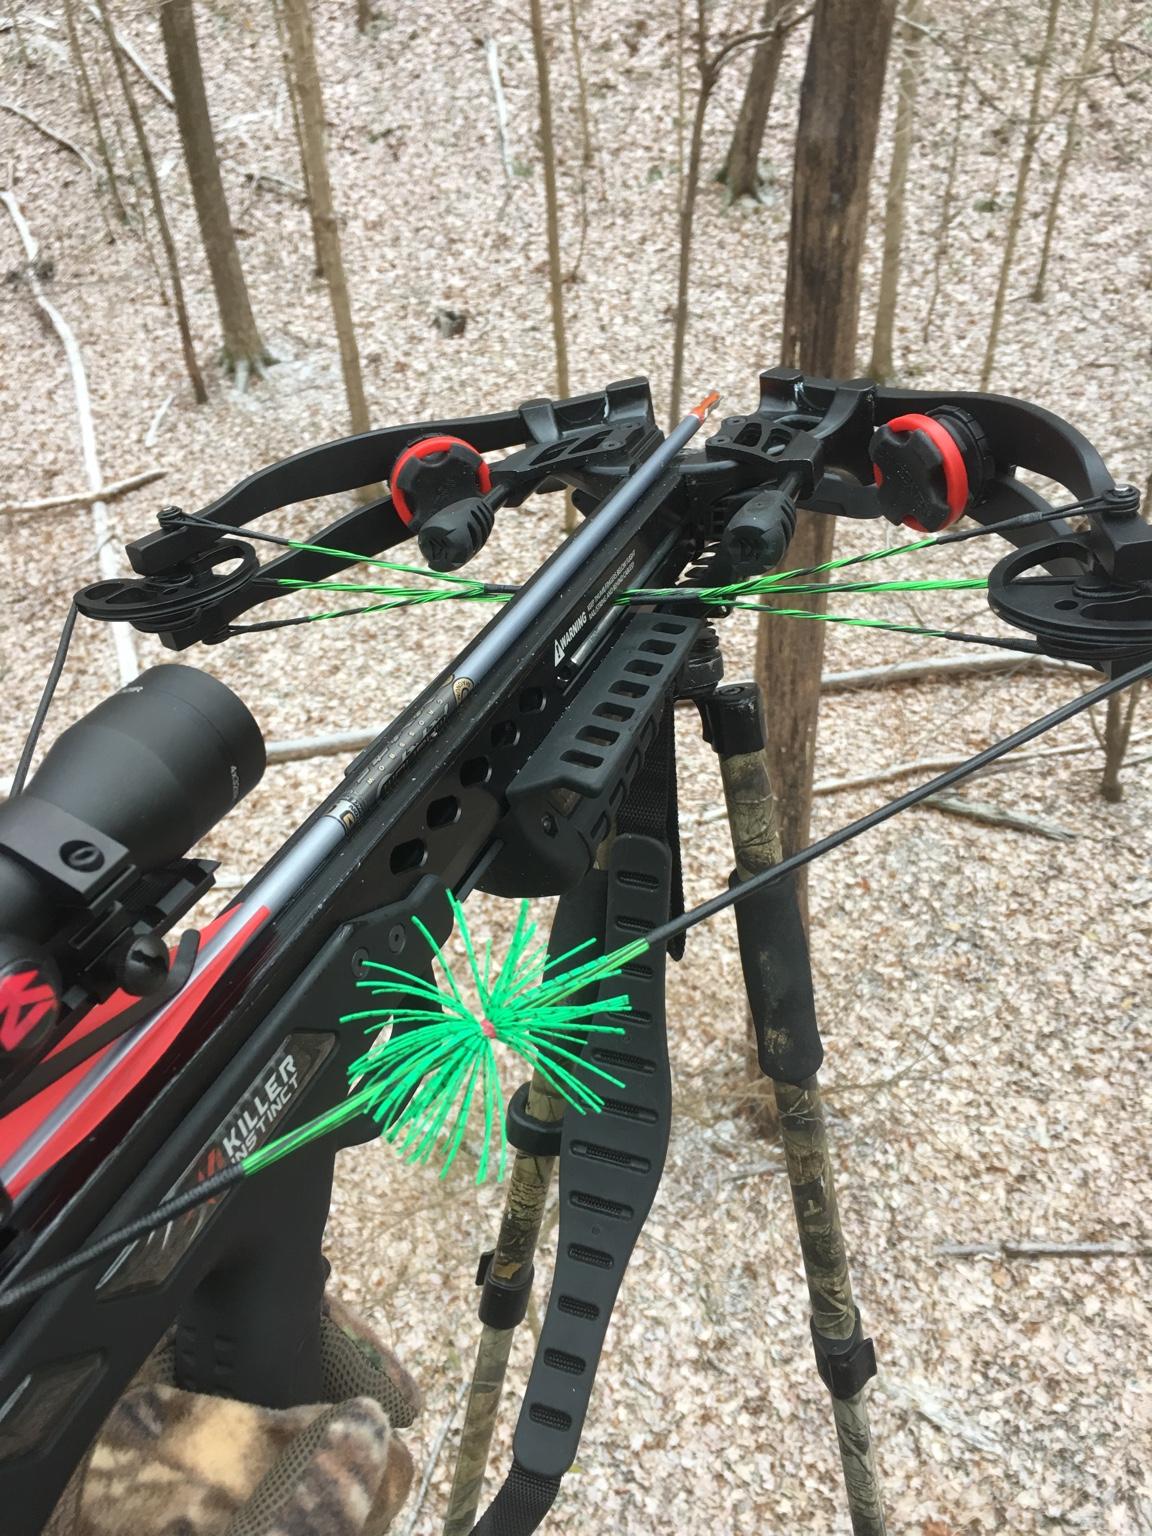 KILLER INSTINCT KI 350 STRING AND CABLE SET